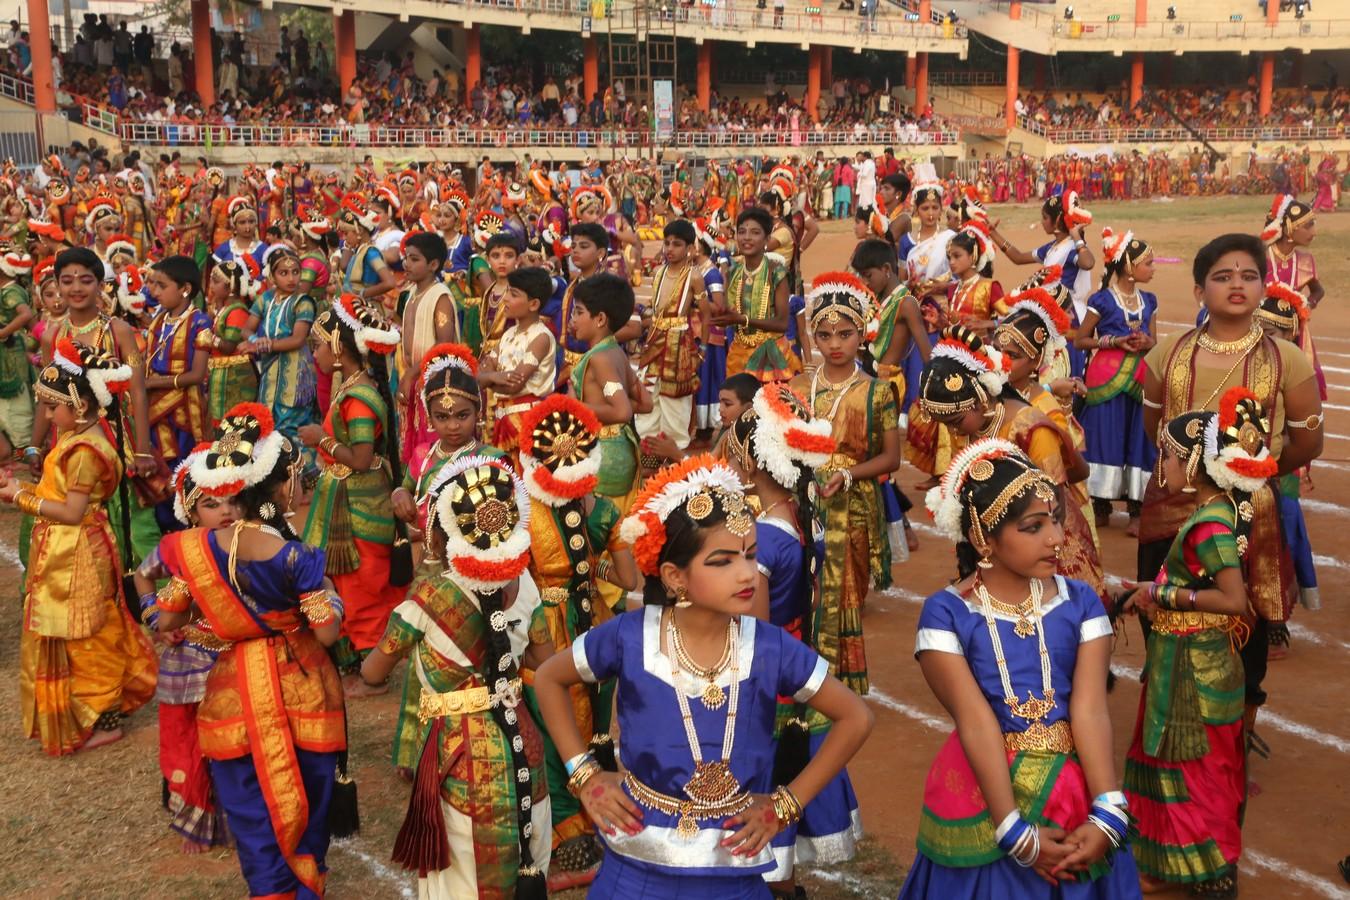 SiliconAndhra International Kuchipudi Dance Convention - Mahabrinda Natyam